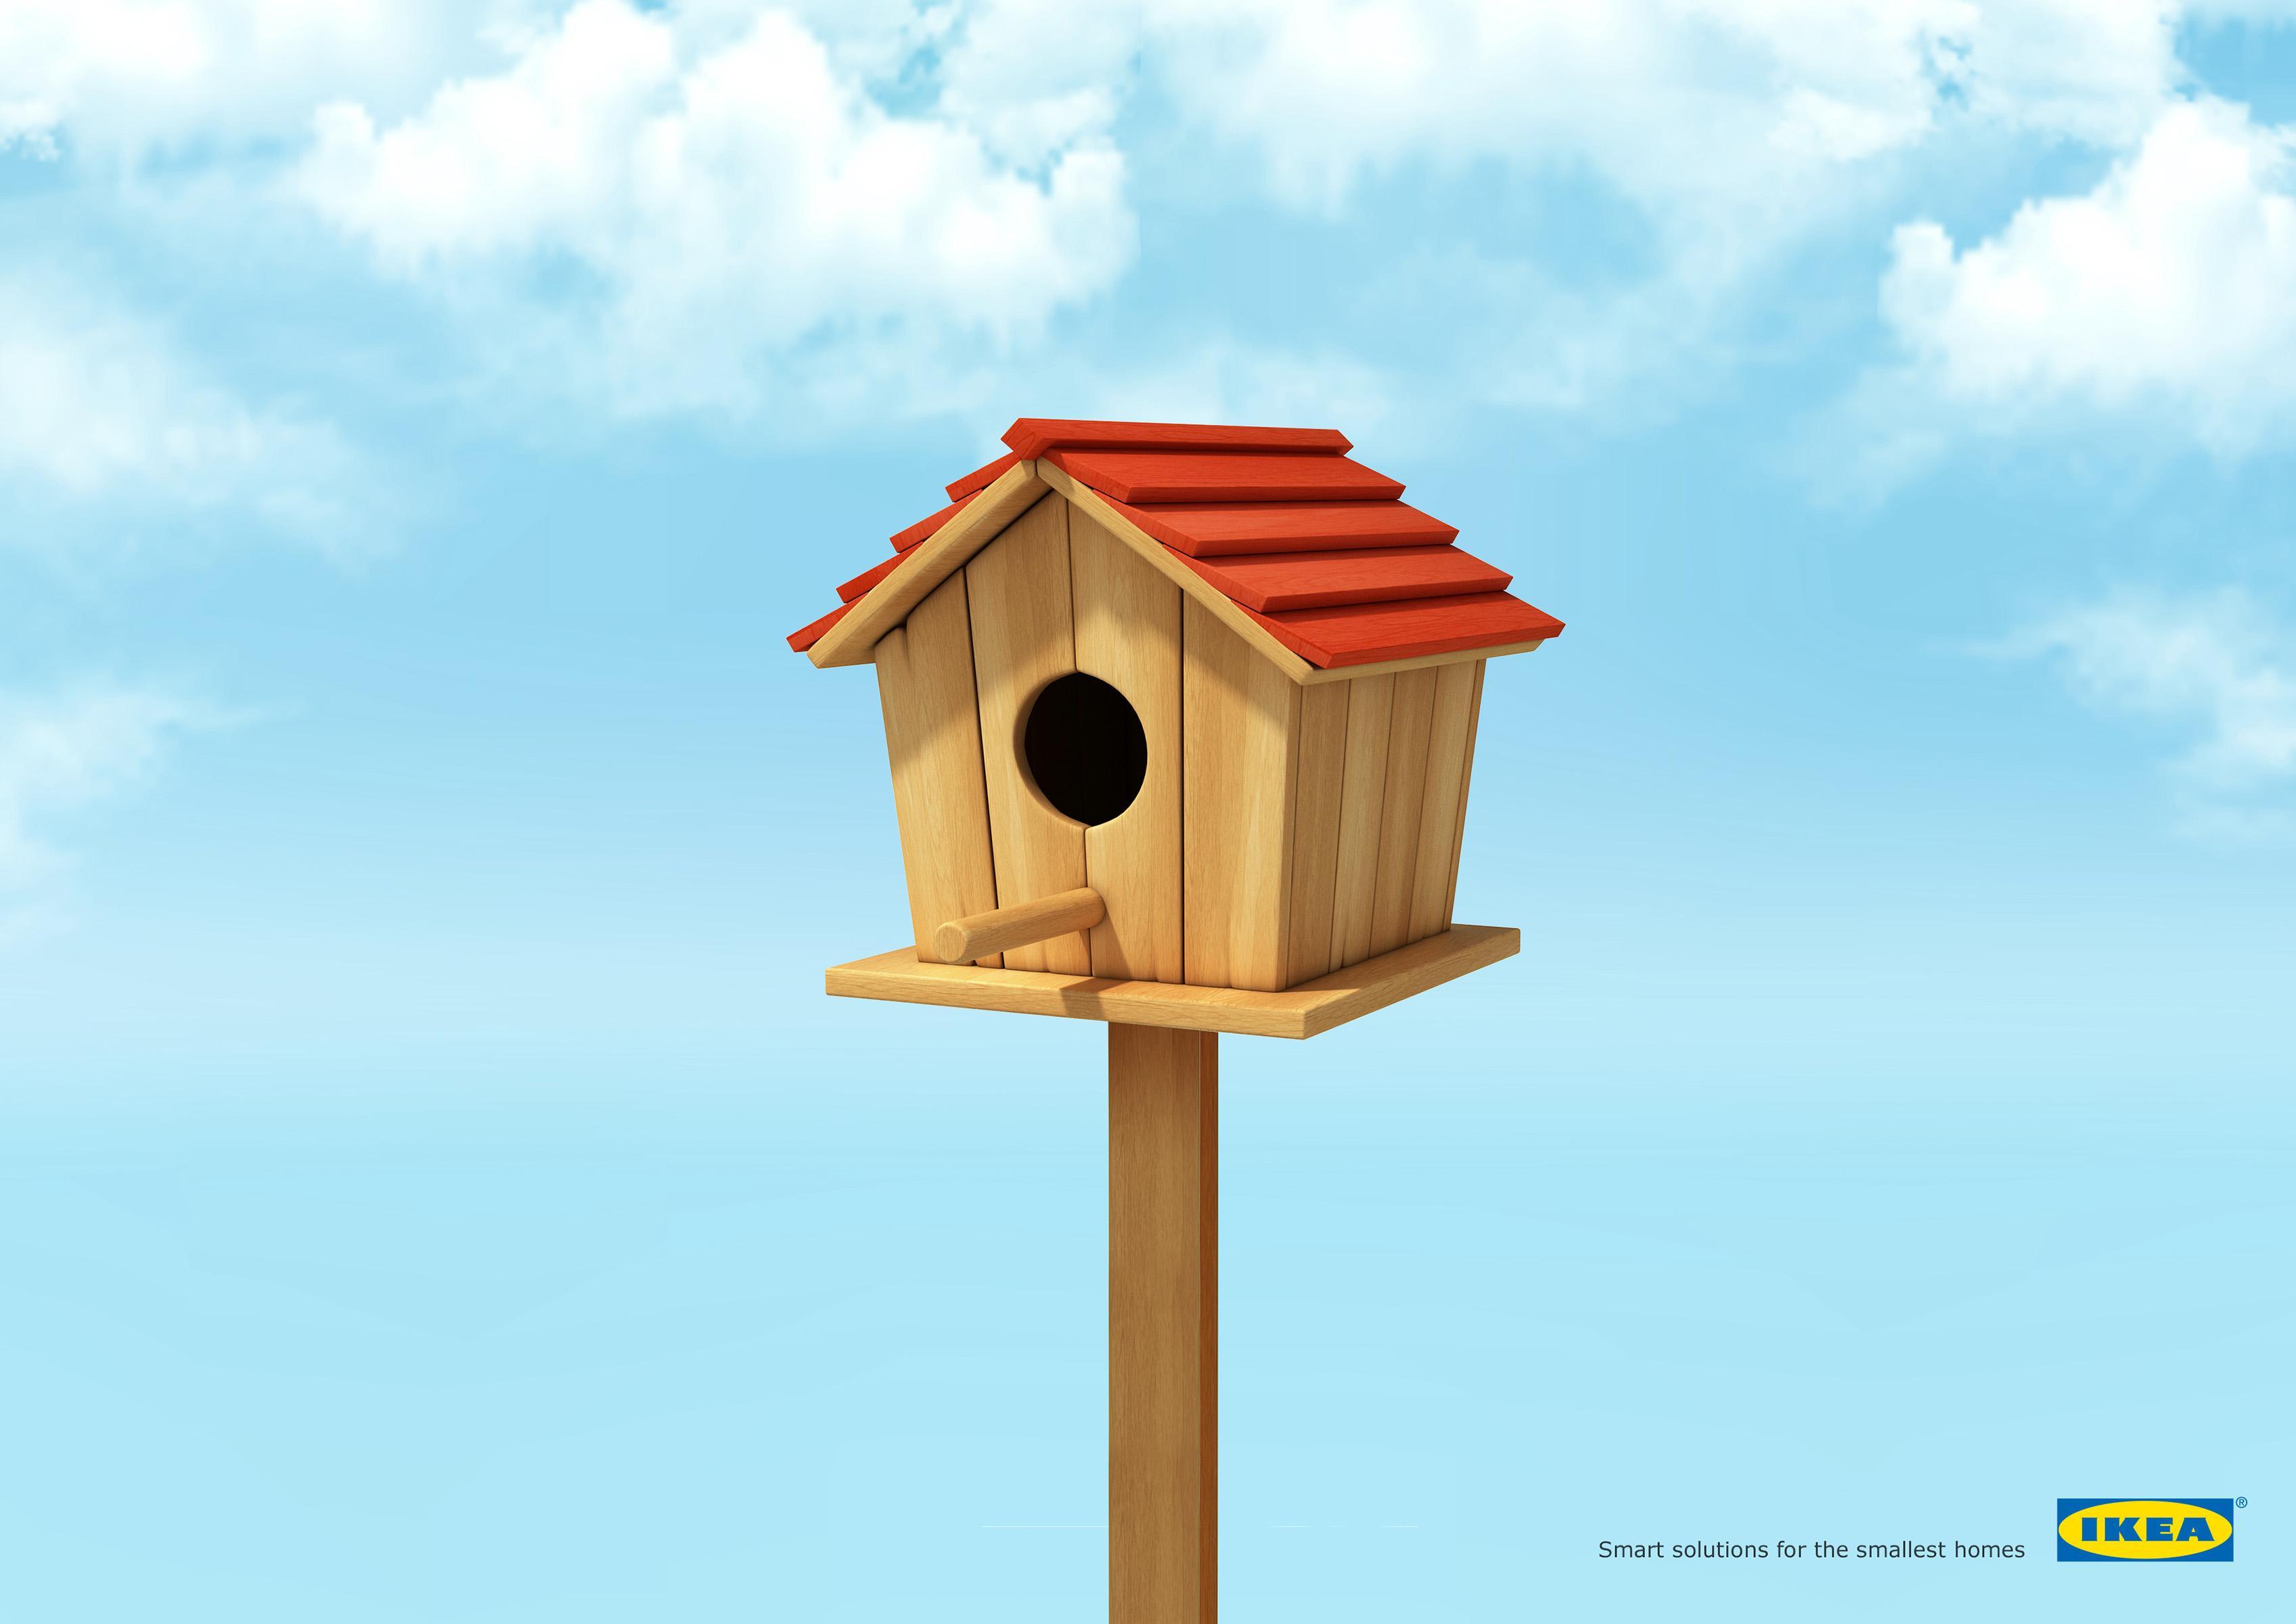 IKEA Print Ad - Smart Solution - Bird House